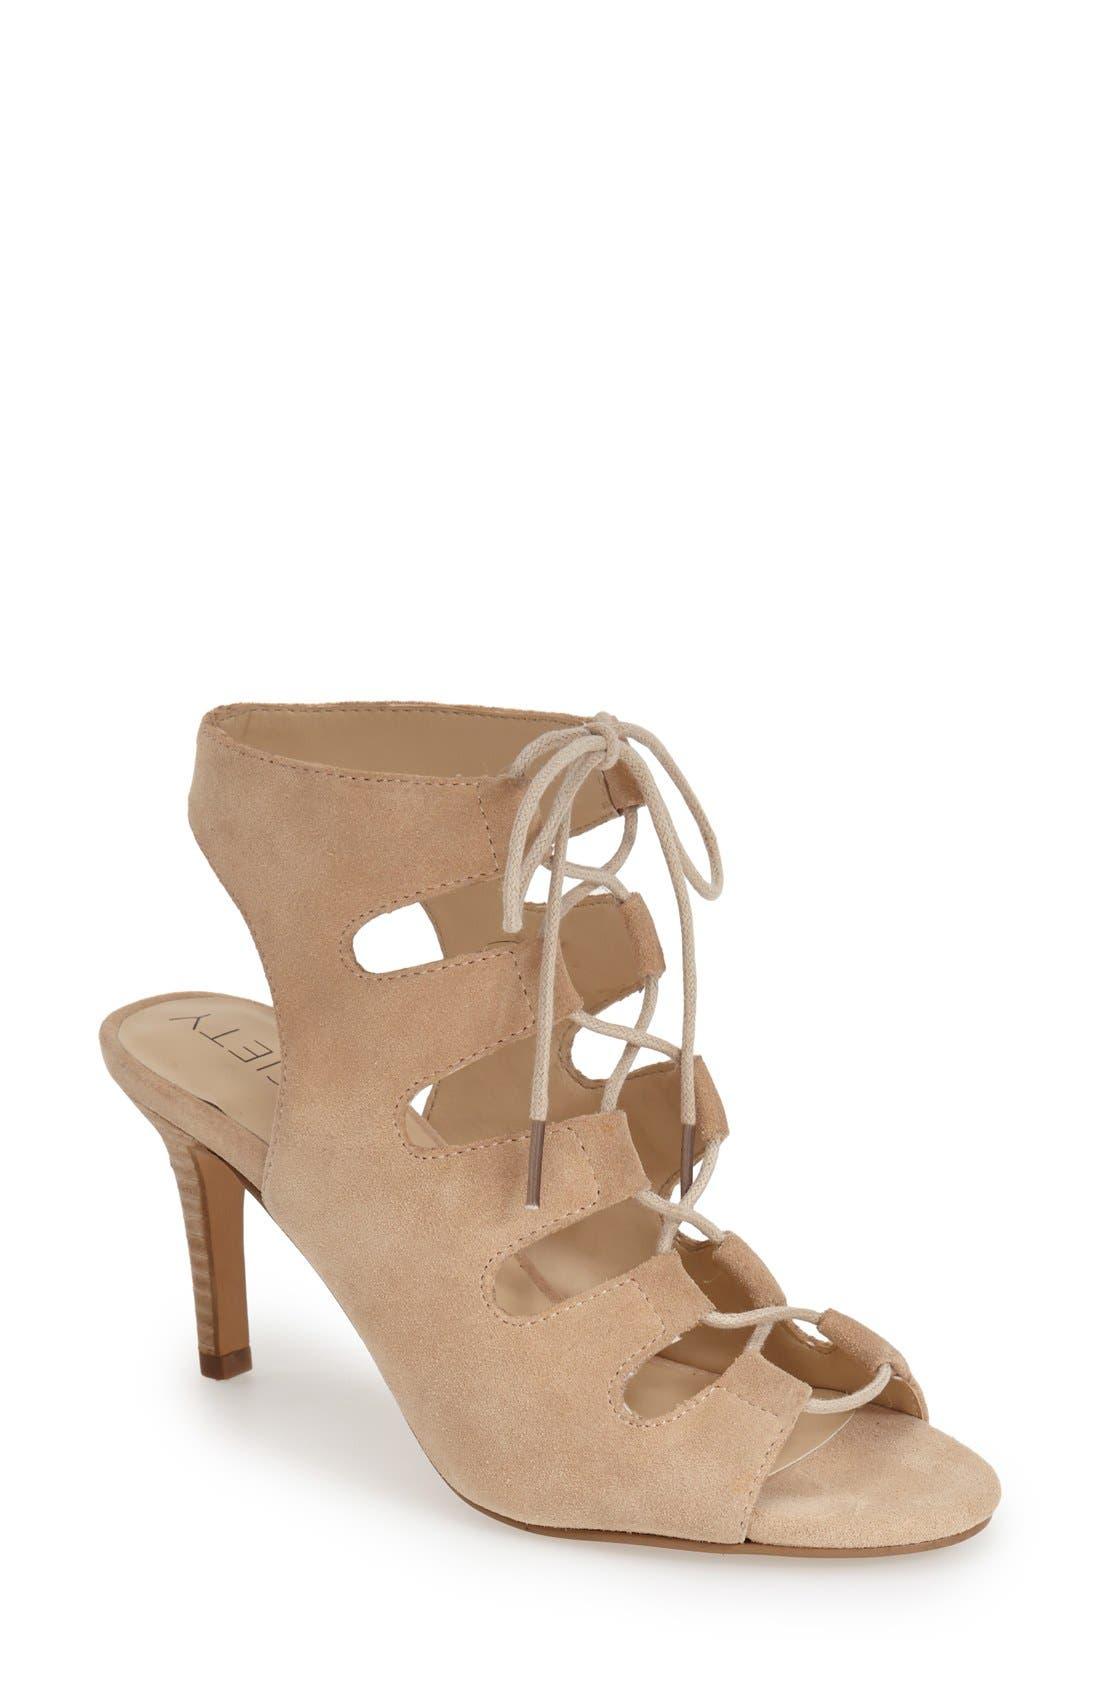 Main Image - Sole Society 'Rosalie' Cutout Sandal (Women)